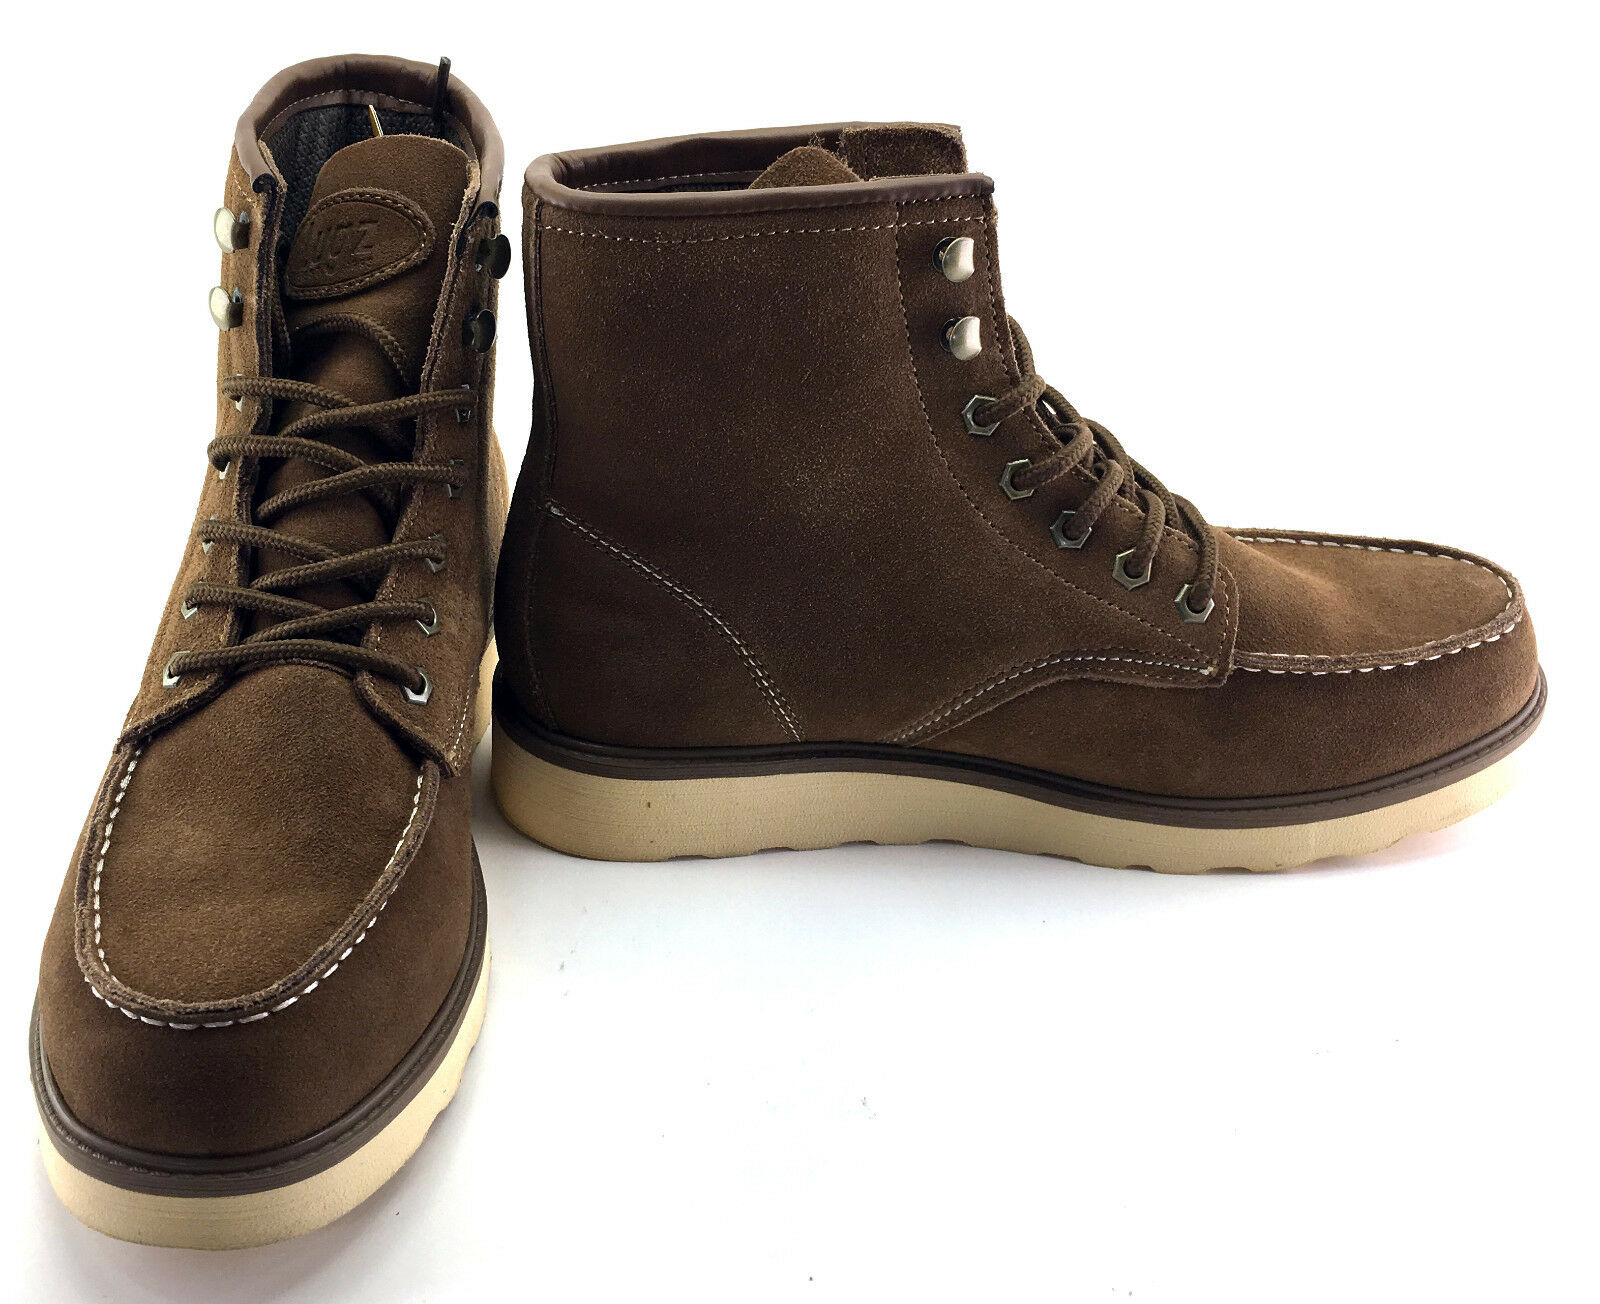 Lugz Boots Prospect Suede Hi Brown Shoes Size 10